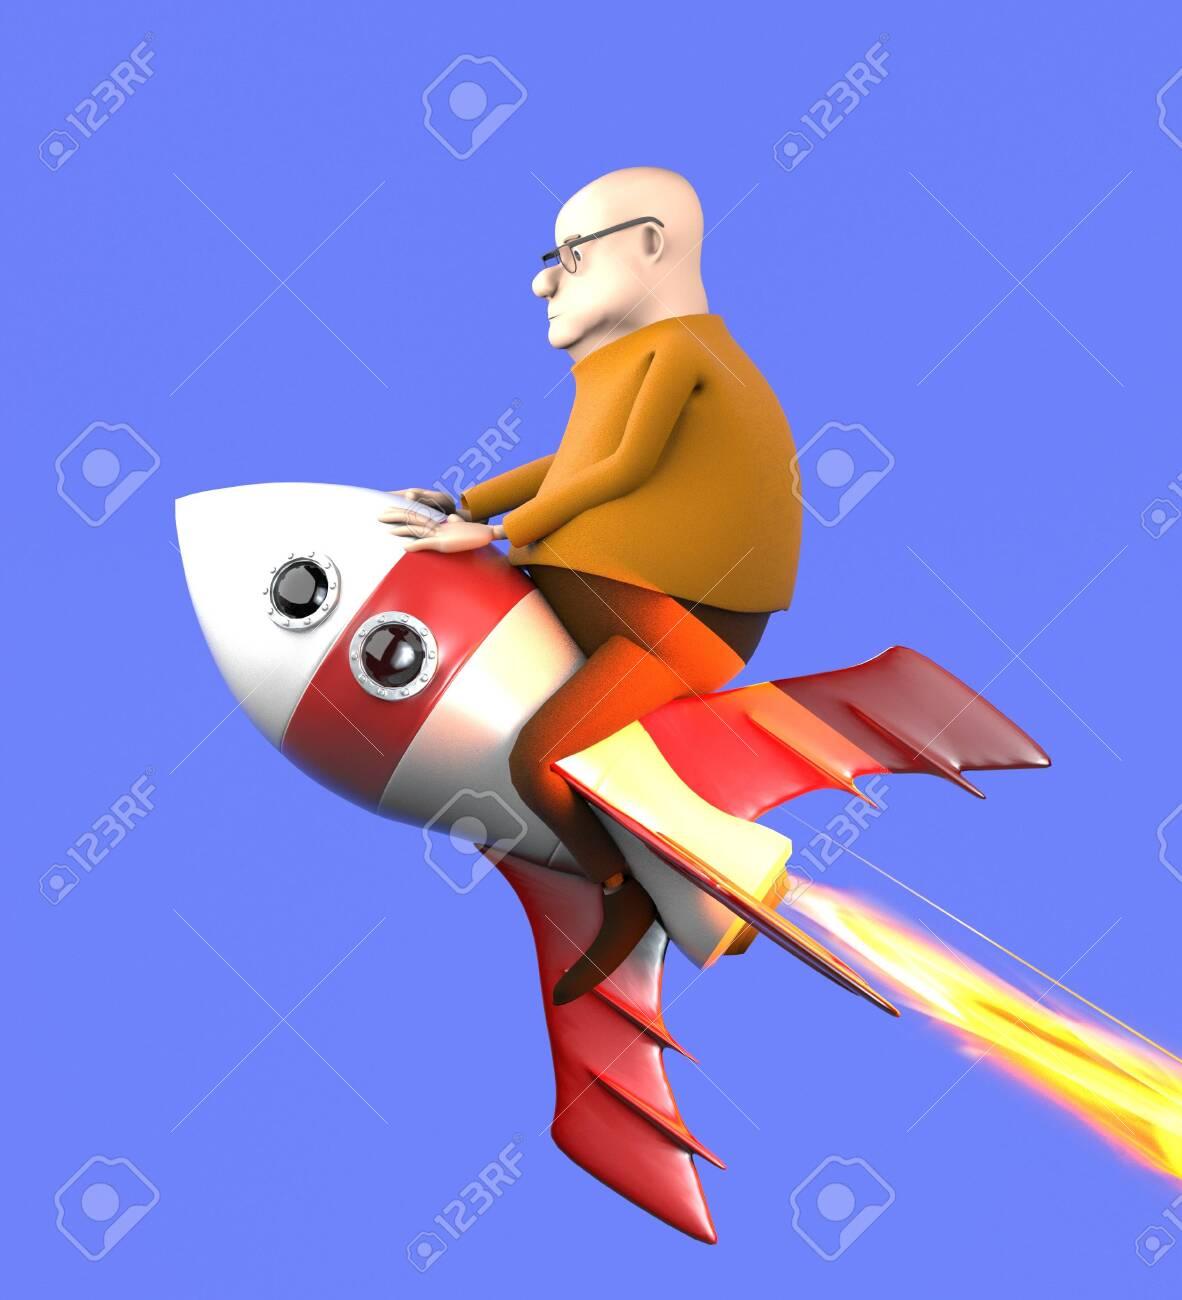 The man on a rocket,cartoon style,3d render. - 148349323